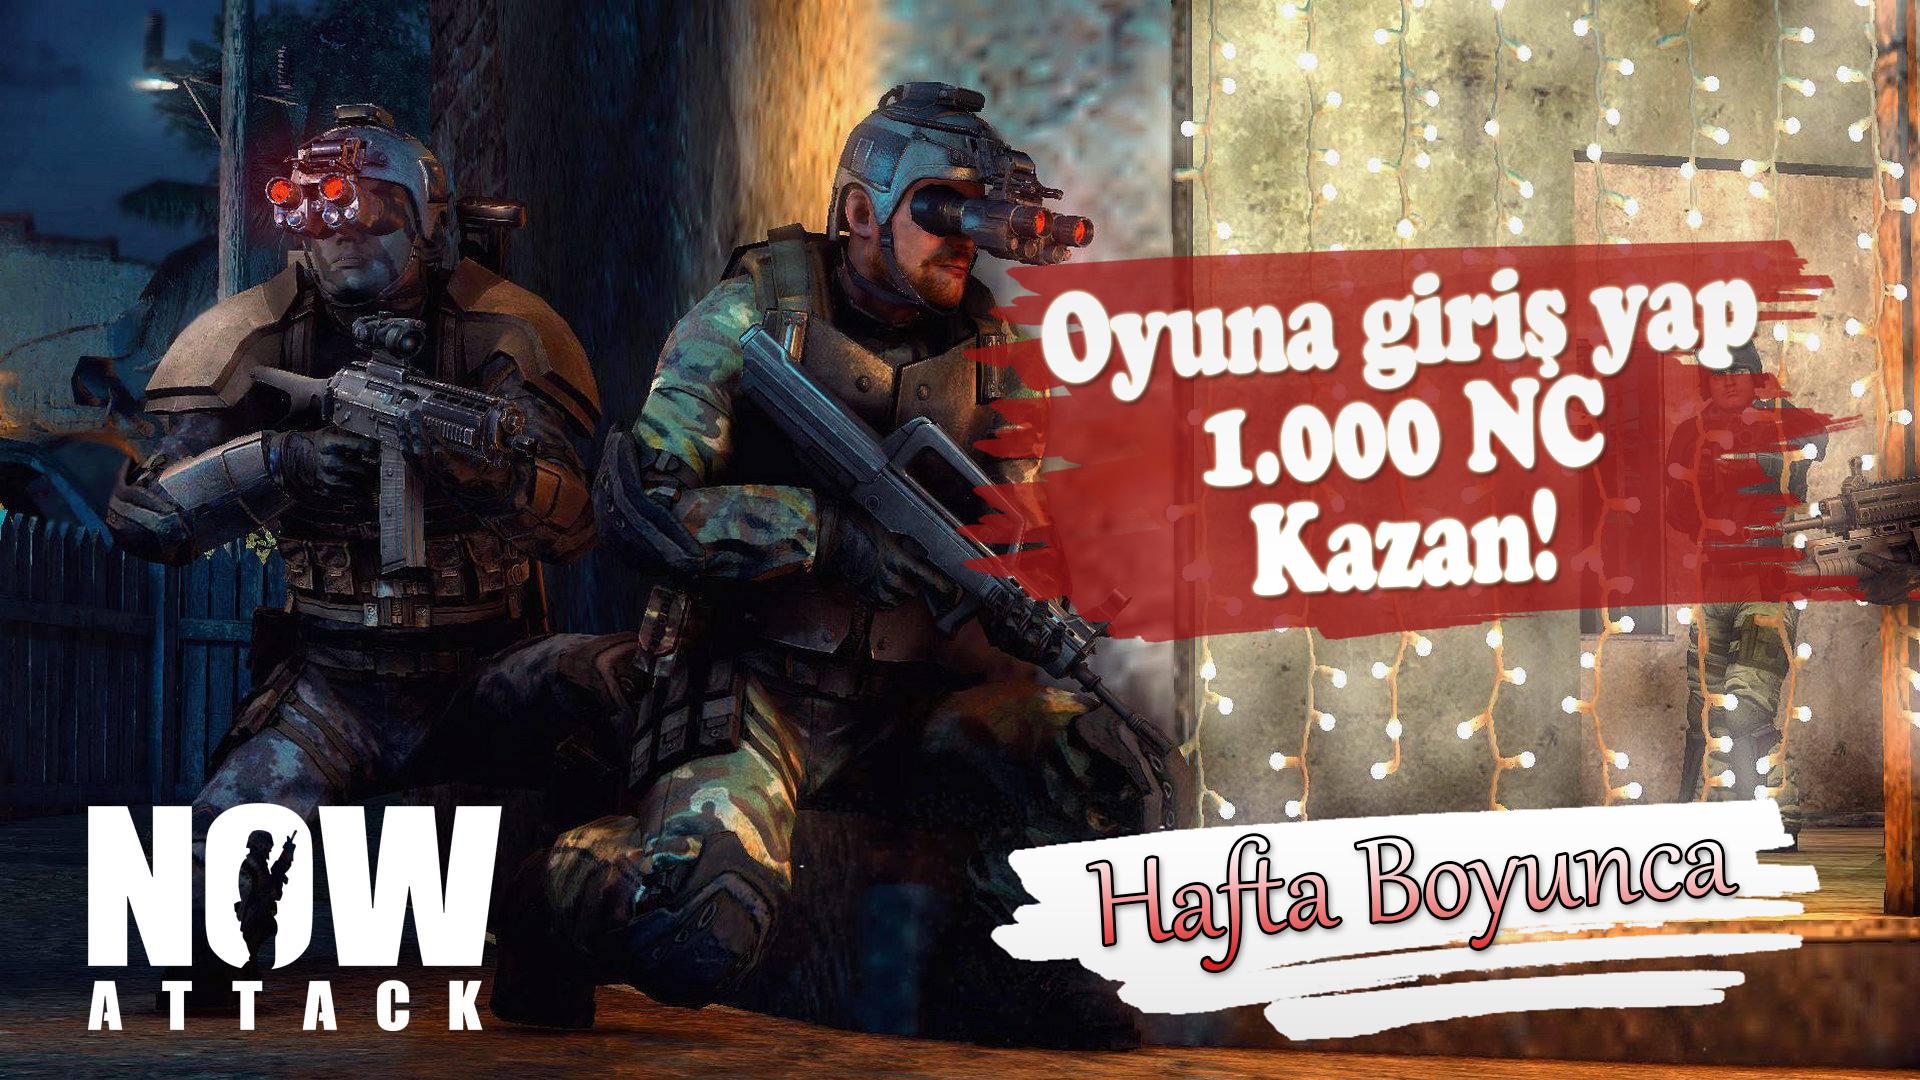 Now Attack'tan Oyuna Giren Herkese 1000 NC Hediye!